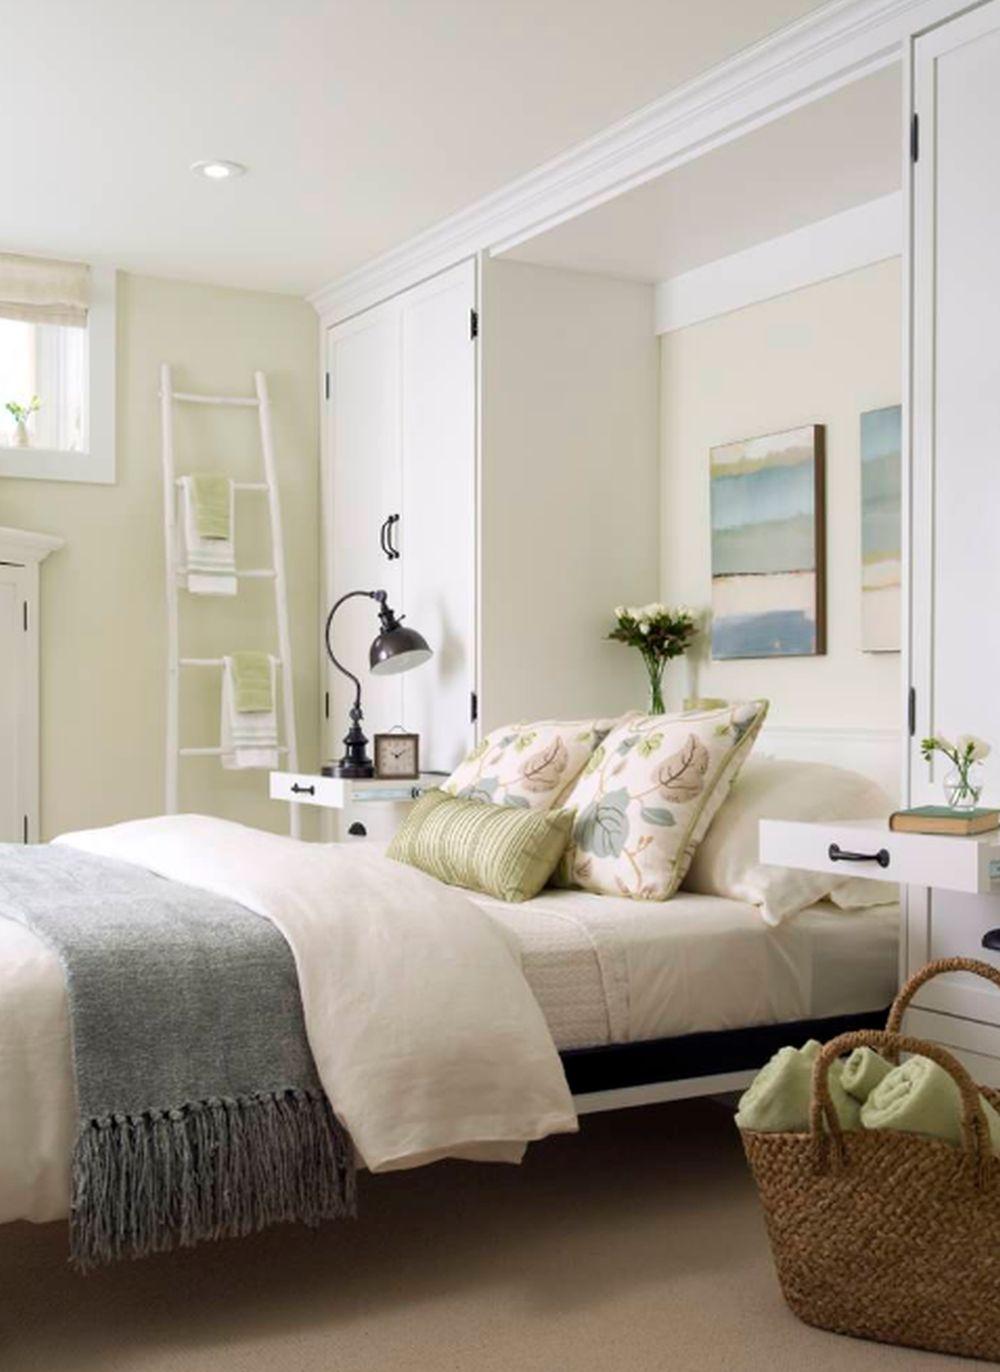 adelaparvu-com-despre-cum-iti-aranjezi-patul-foto-laura-stein-interiors